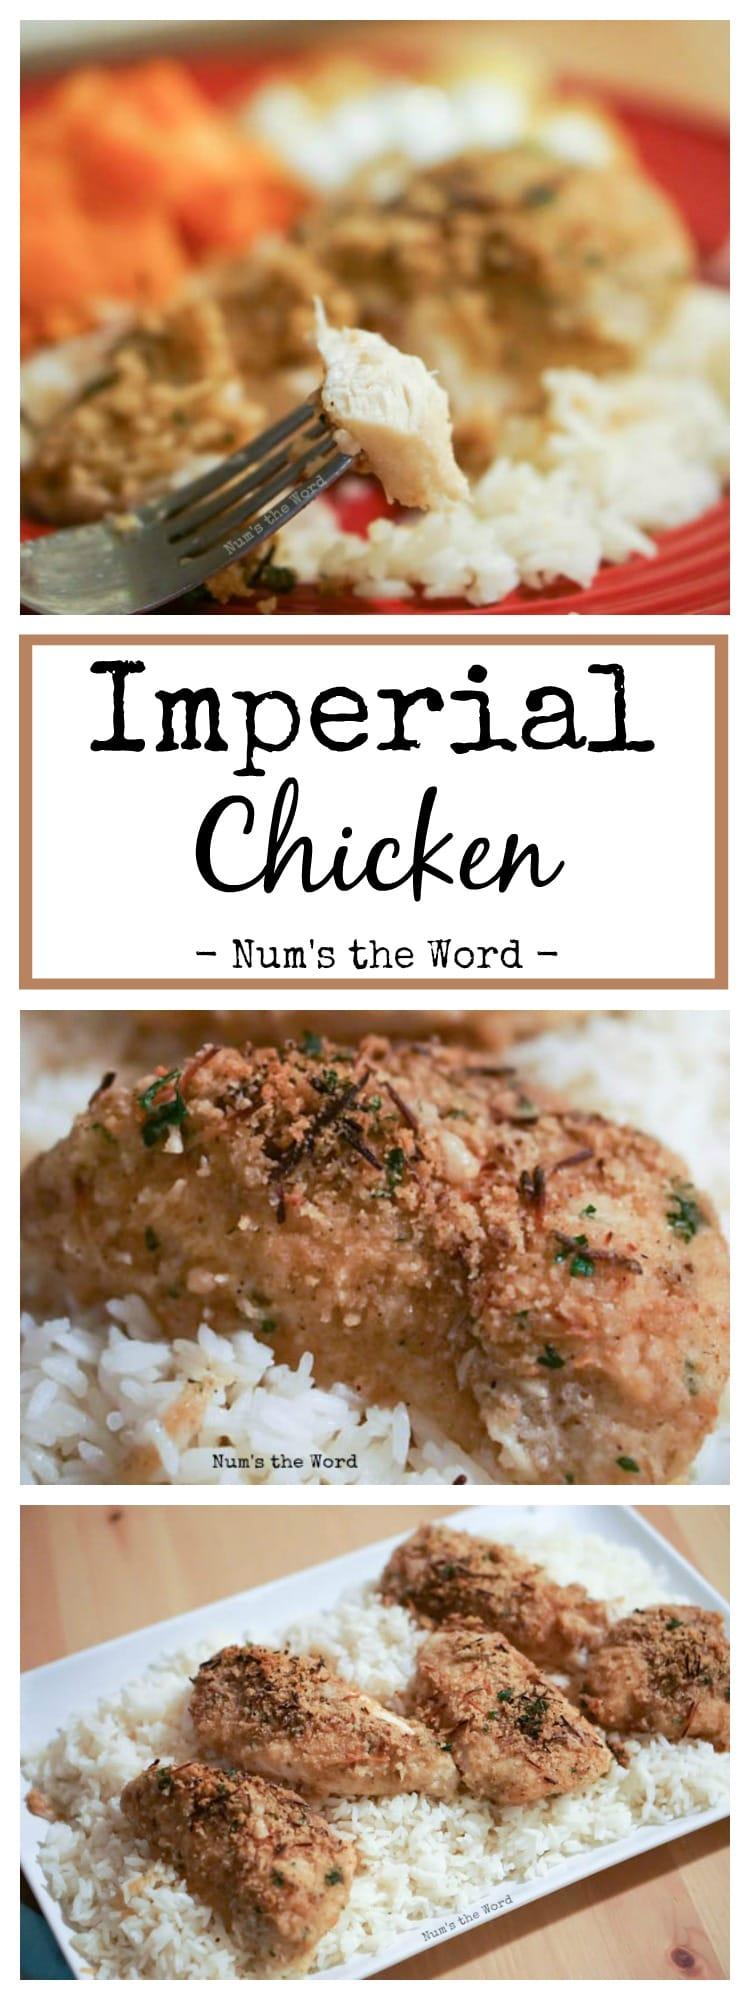 Imperial Chicken